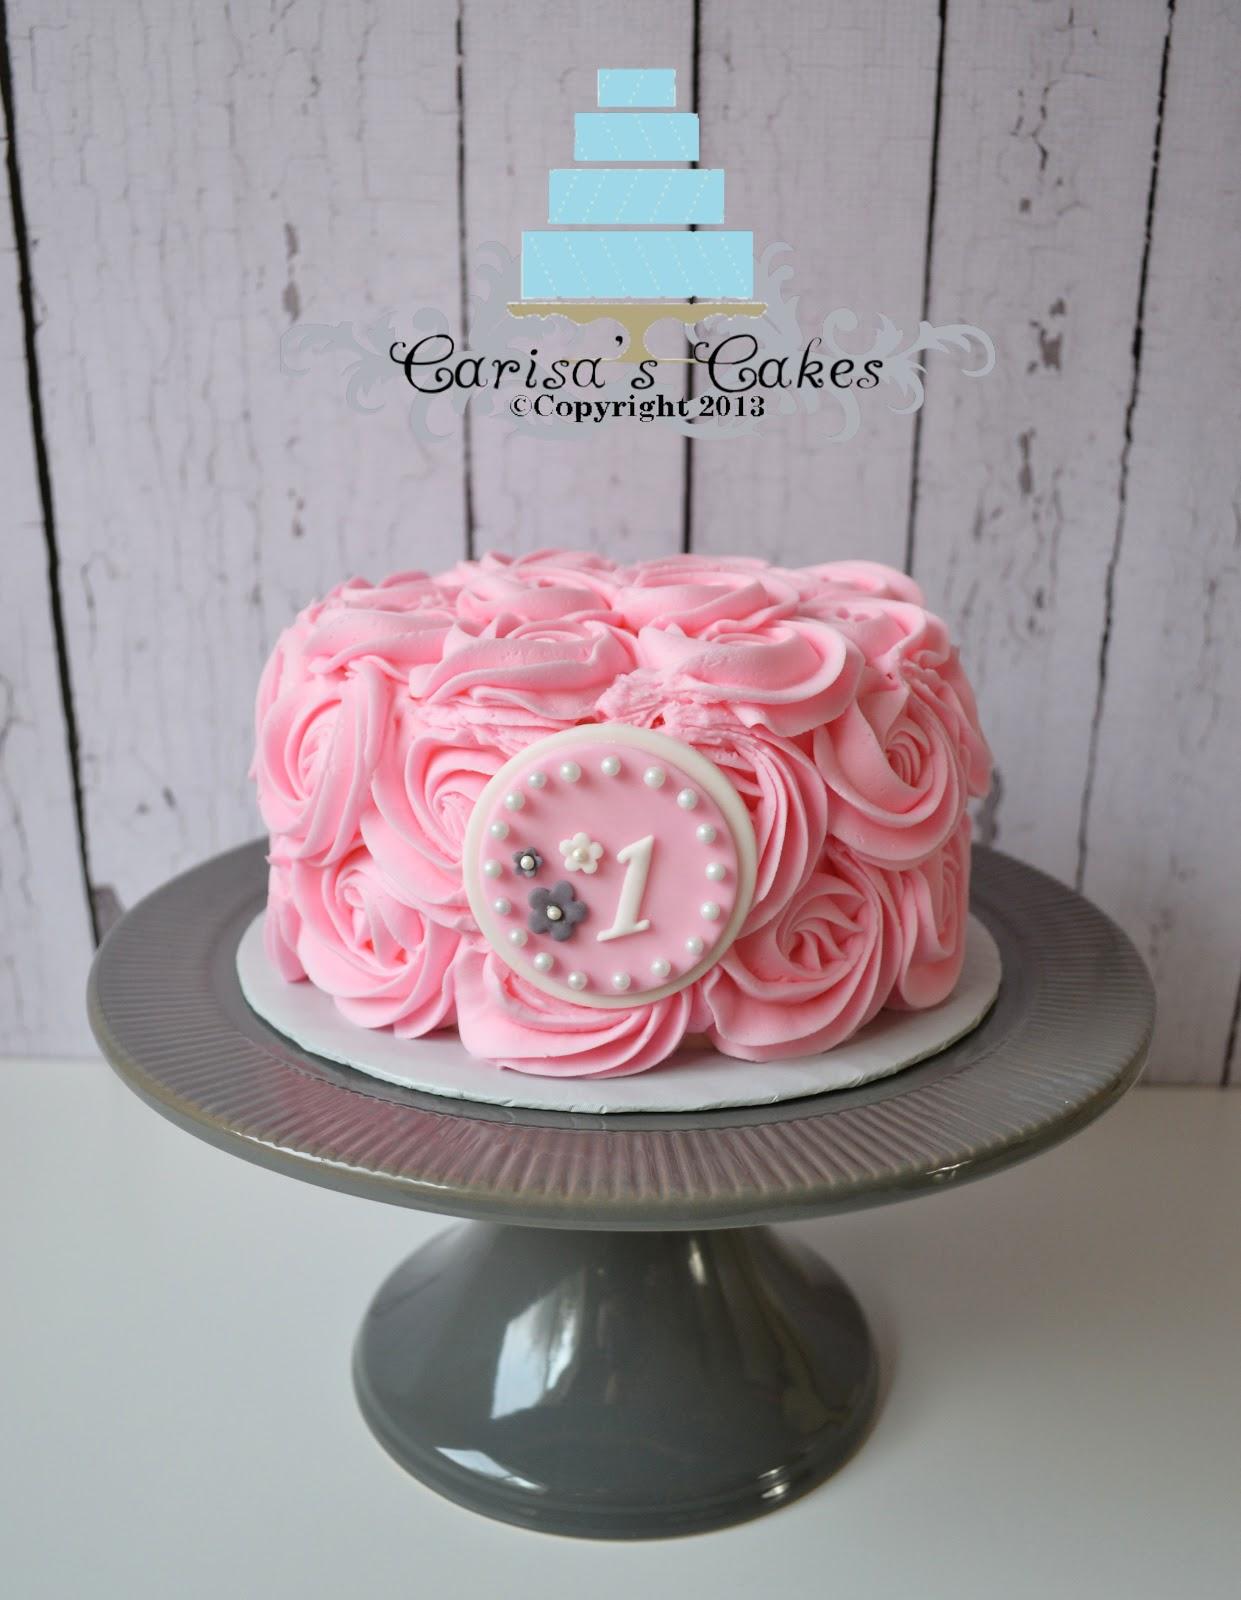 Carisa S Cakes Rose Swirl Smash Cake